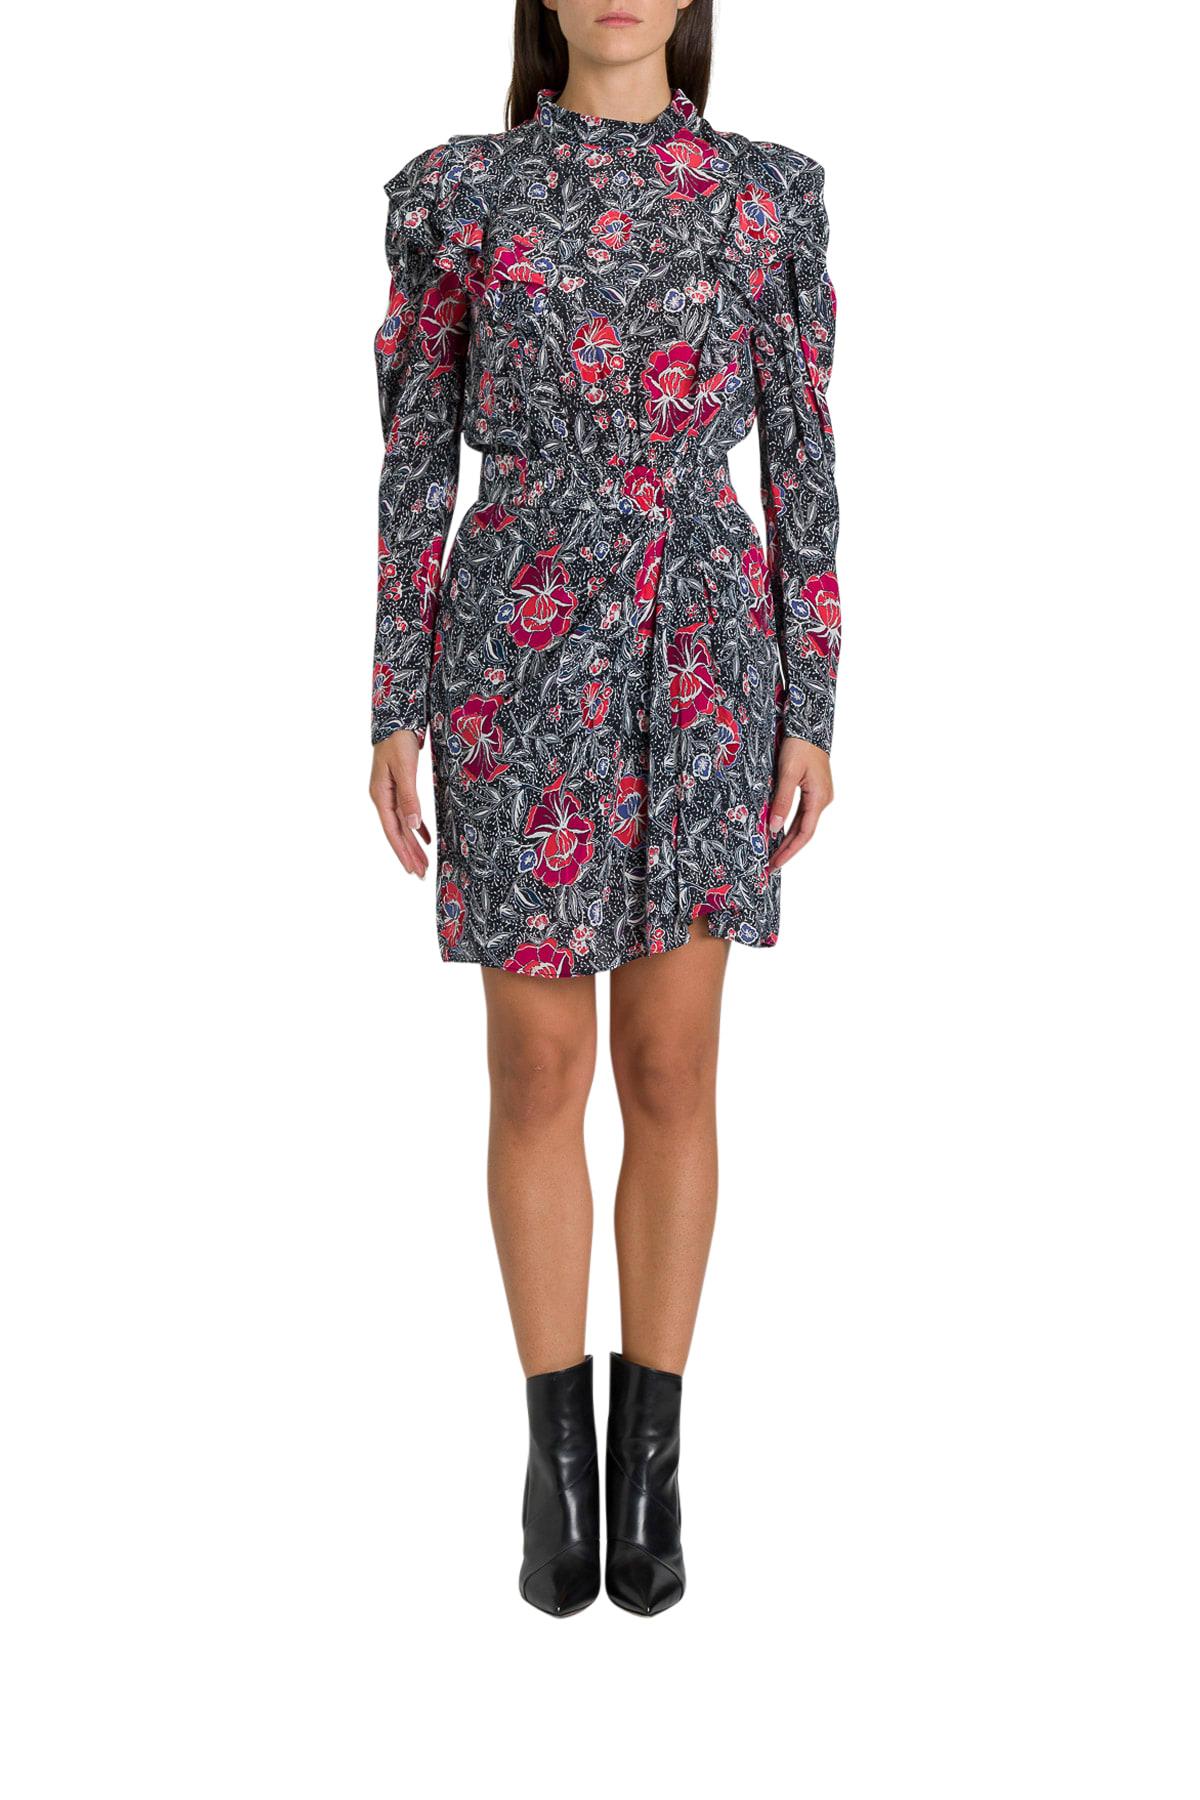 Buy Isabel Marant Étoile Yoana Dress online, shop Isabel Marant Étoile with free shipping